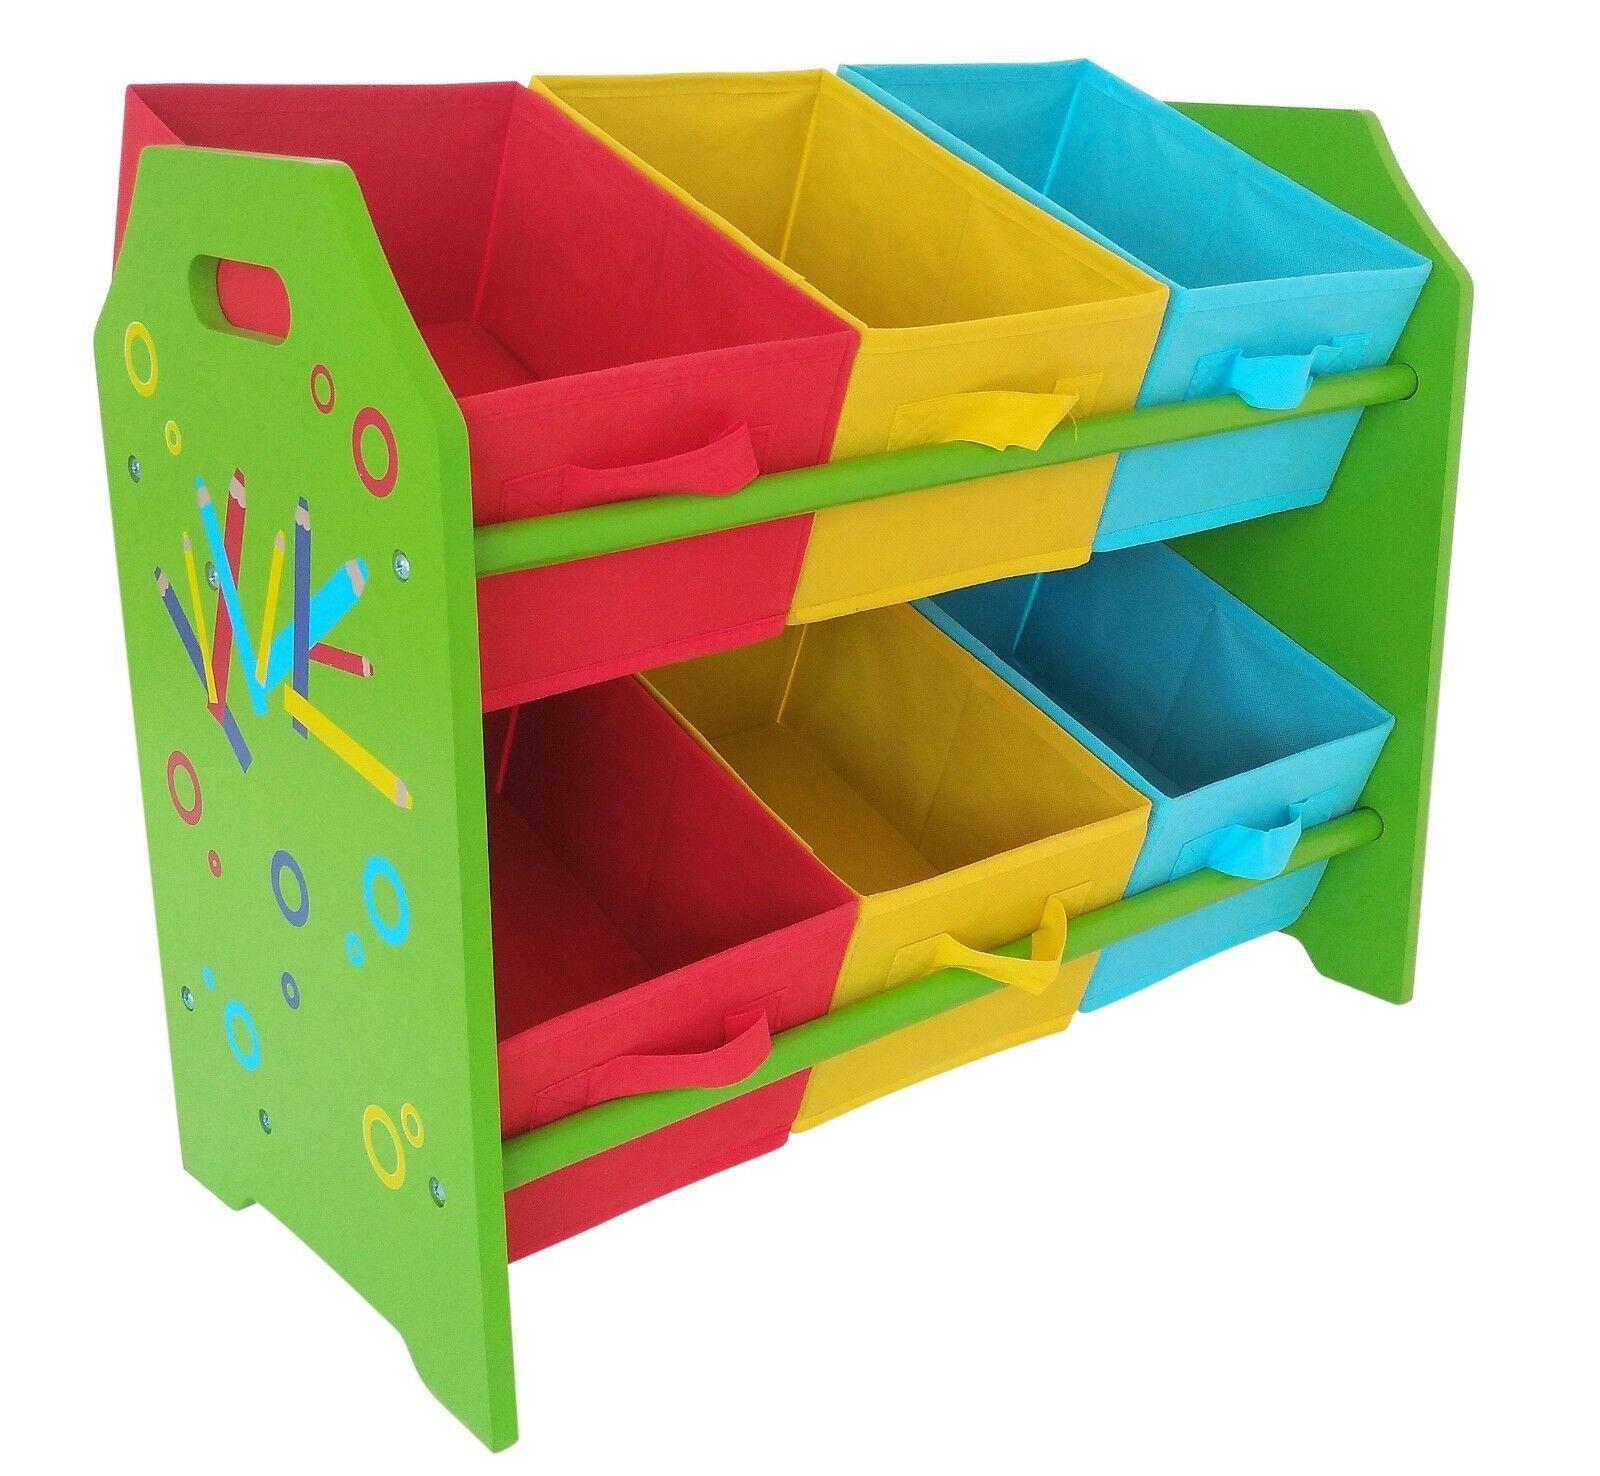 Kids Childrens Pencil Crayon 2 Tier Toy Wooden Storage Unit 6 Cube Bins Baskets